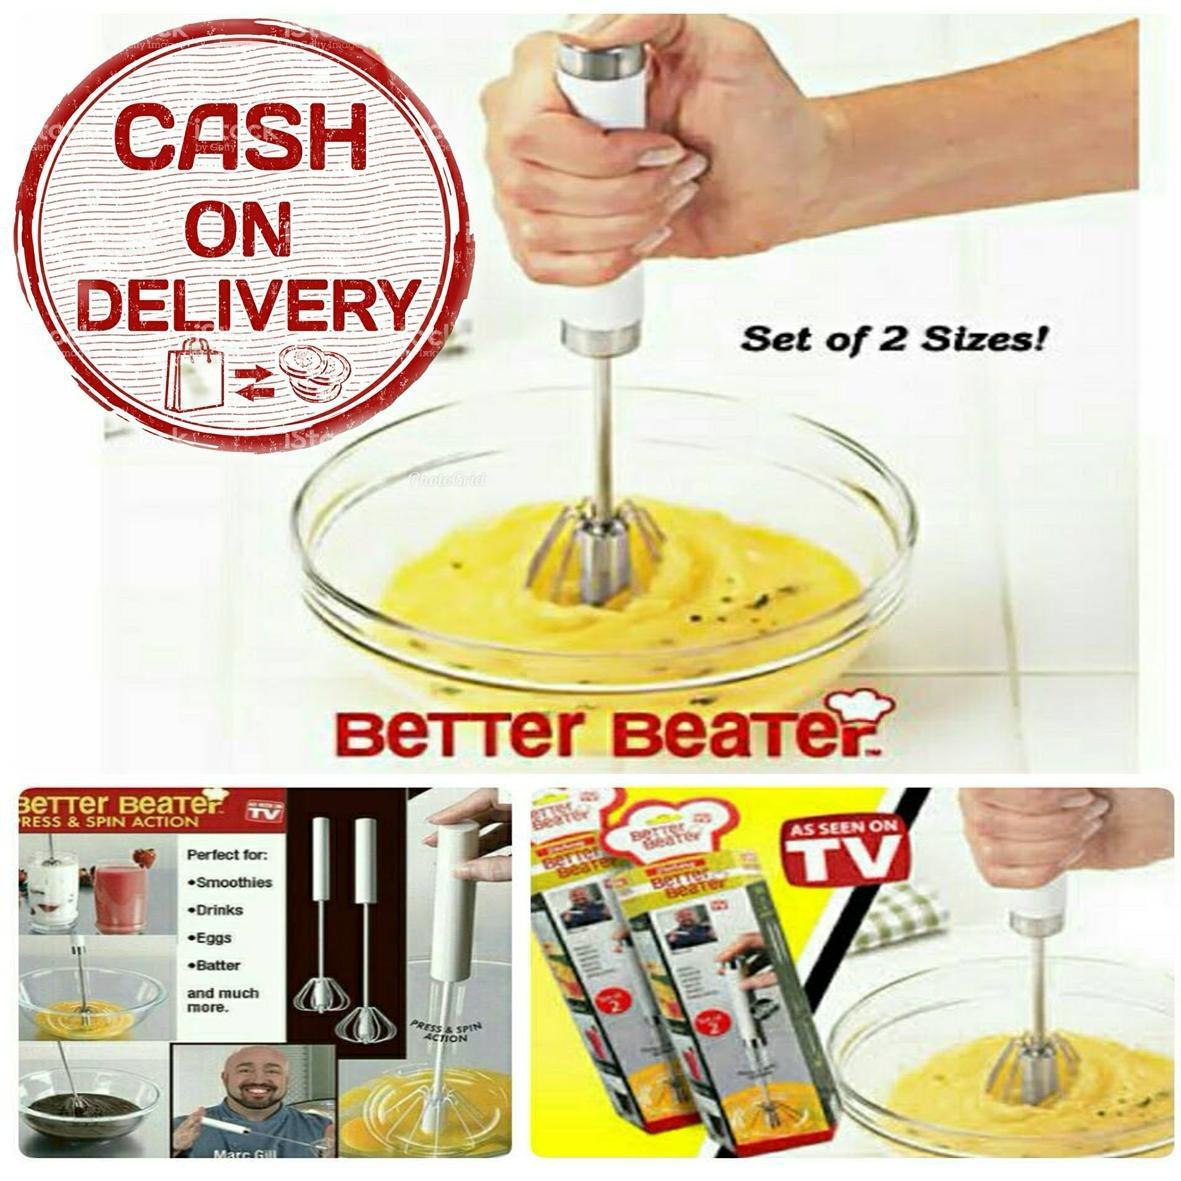 kado unik– mixer better beater set alat pengocok telur / pengocok telur praktis / rotatable hmixer / mixer telur  / mixer pengocok telur portable